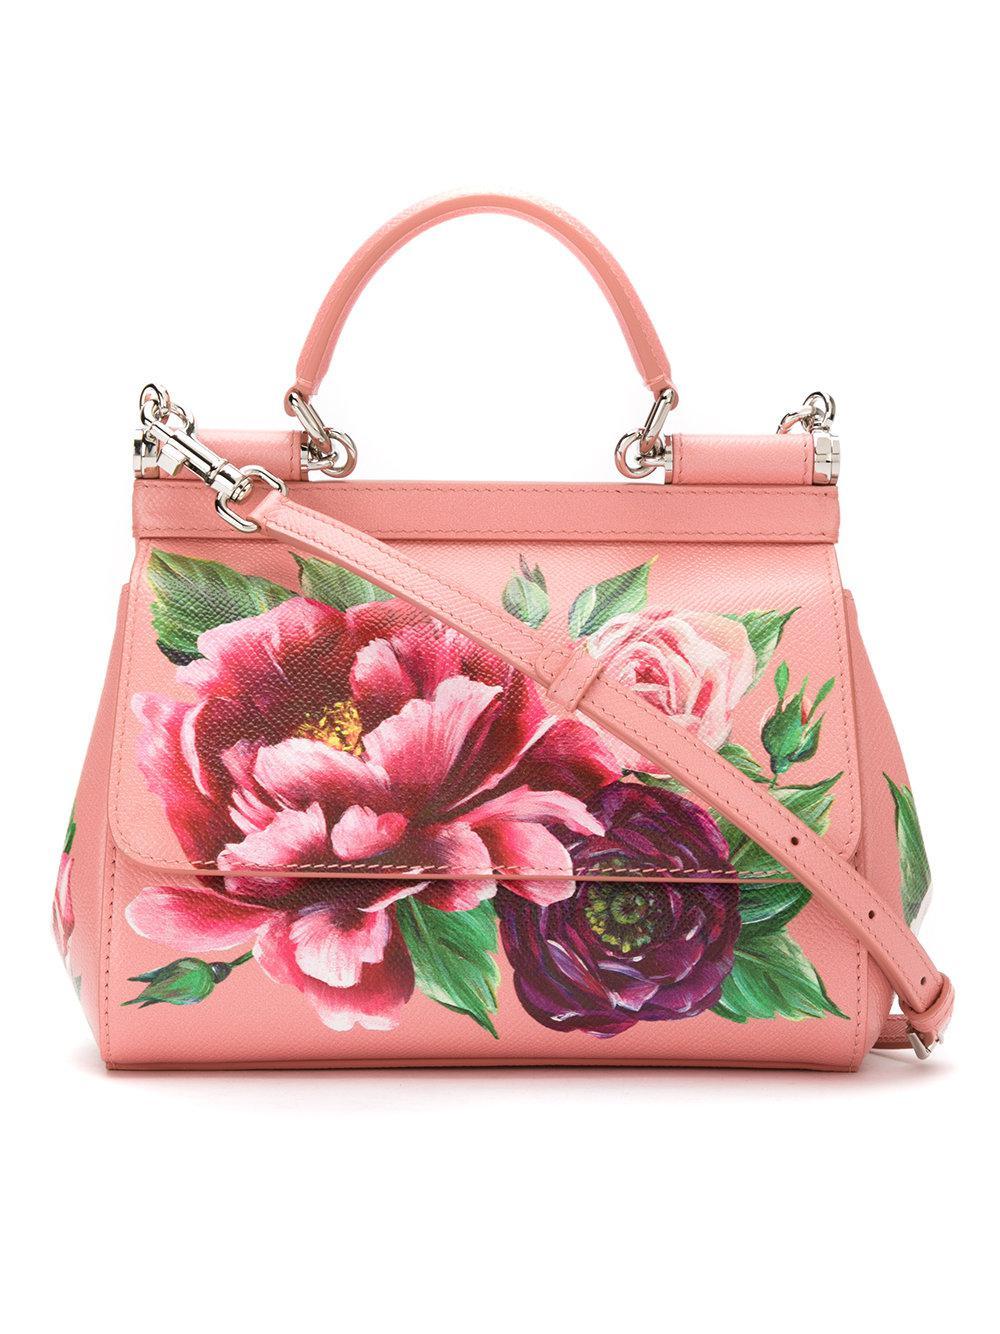 3b963a72398 ... Dolce Gabbana. Womens Pink Sicily Printed Calfskin Bag cheap for  discount c9e5e 390af . ...